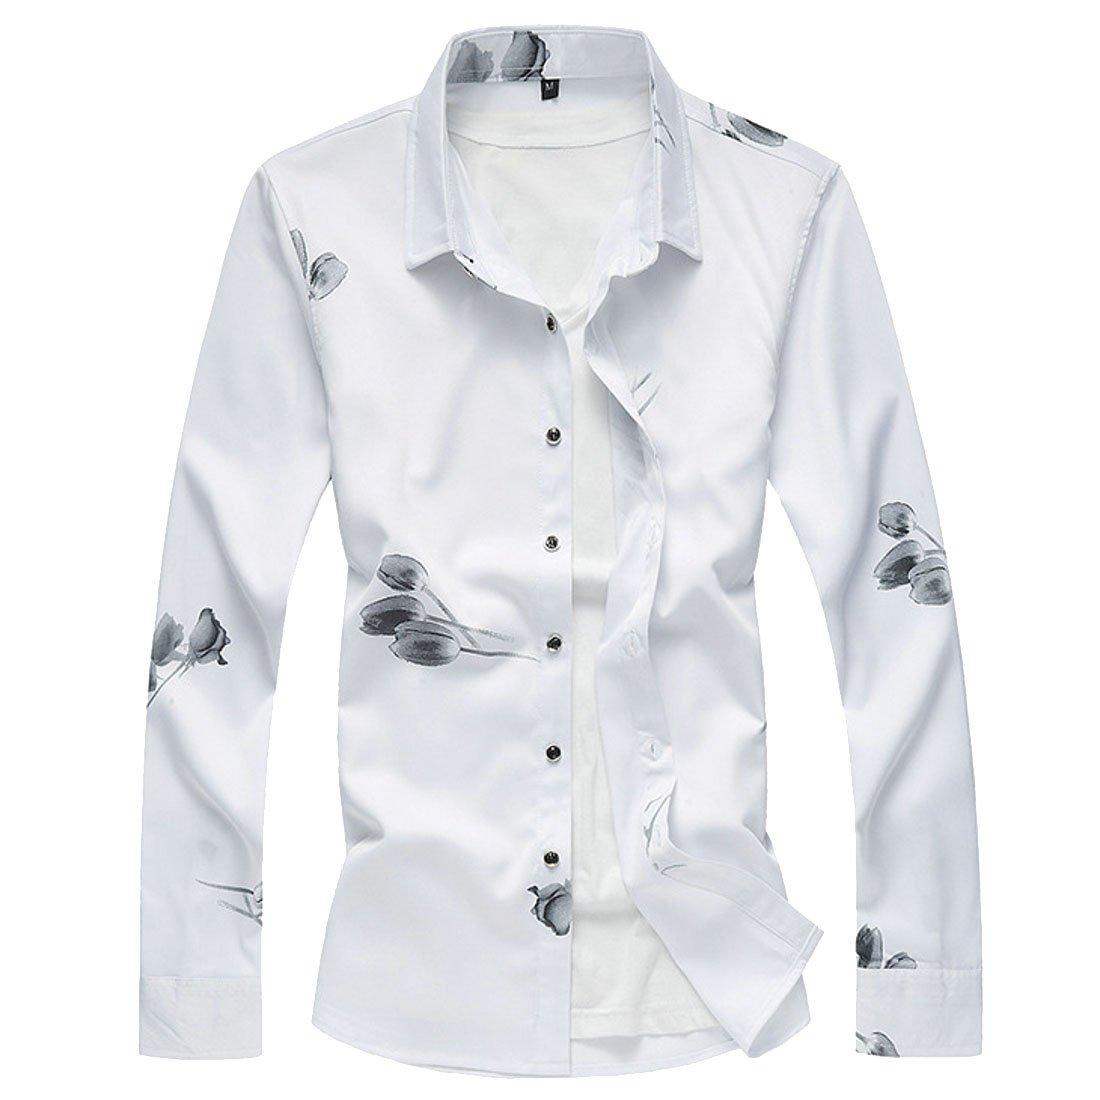 Fubotevic Mens Formal Button Down Lapel Plus Size Floral Fashion Dress Shirts